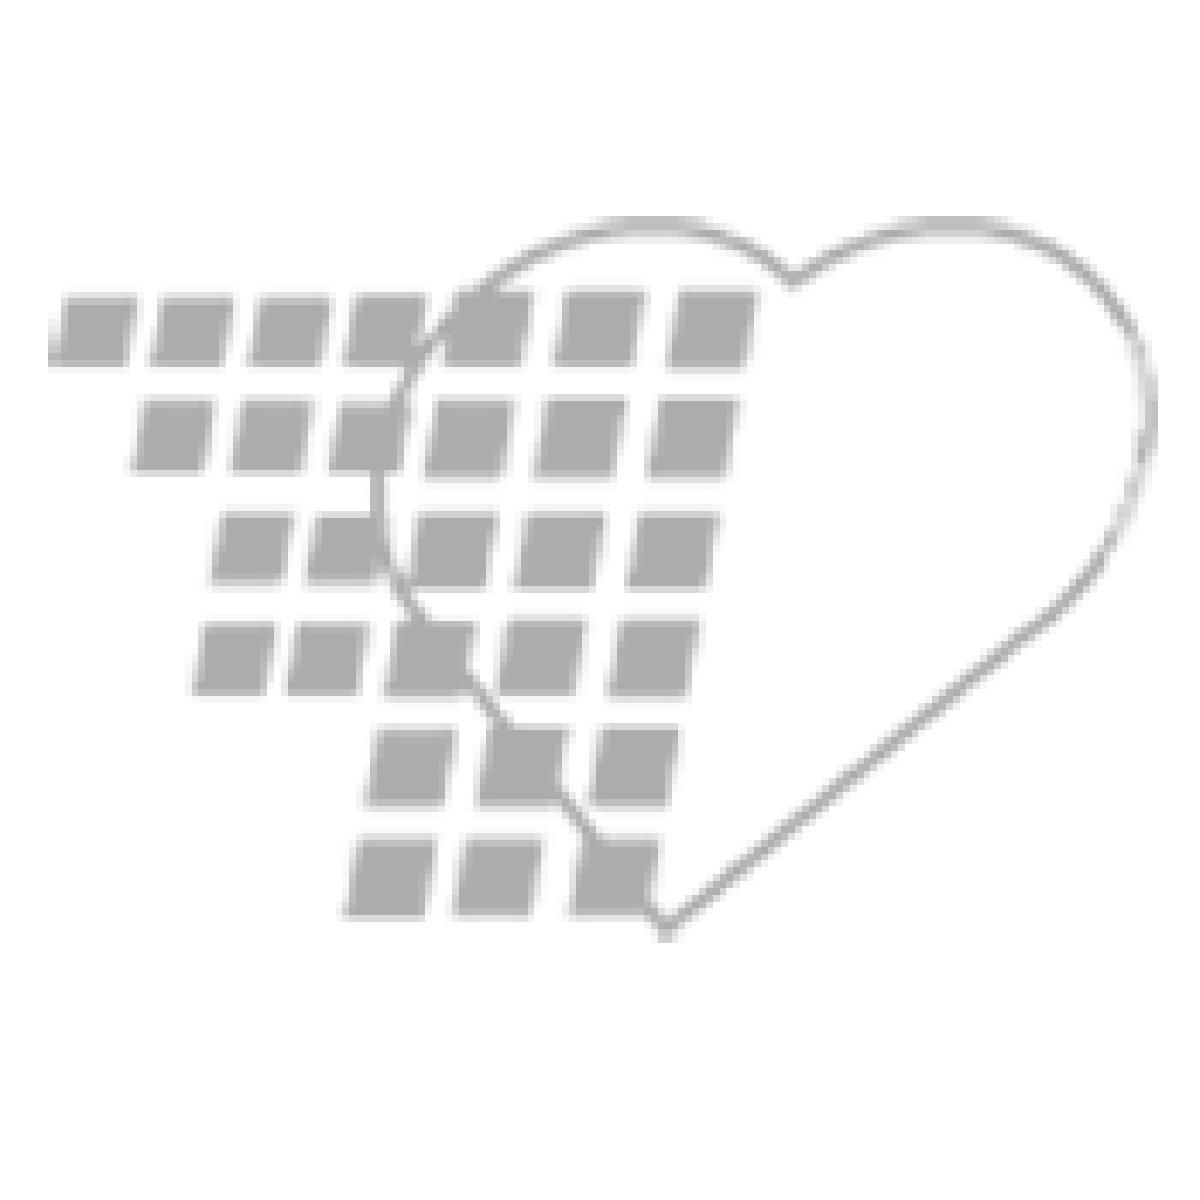 07-71-4500 Pocket Nurse® CPR Face Shield King Ring Case Only